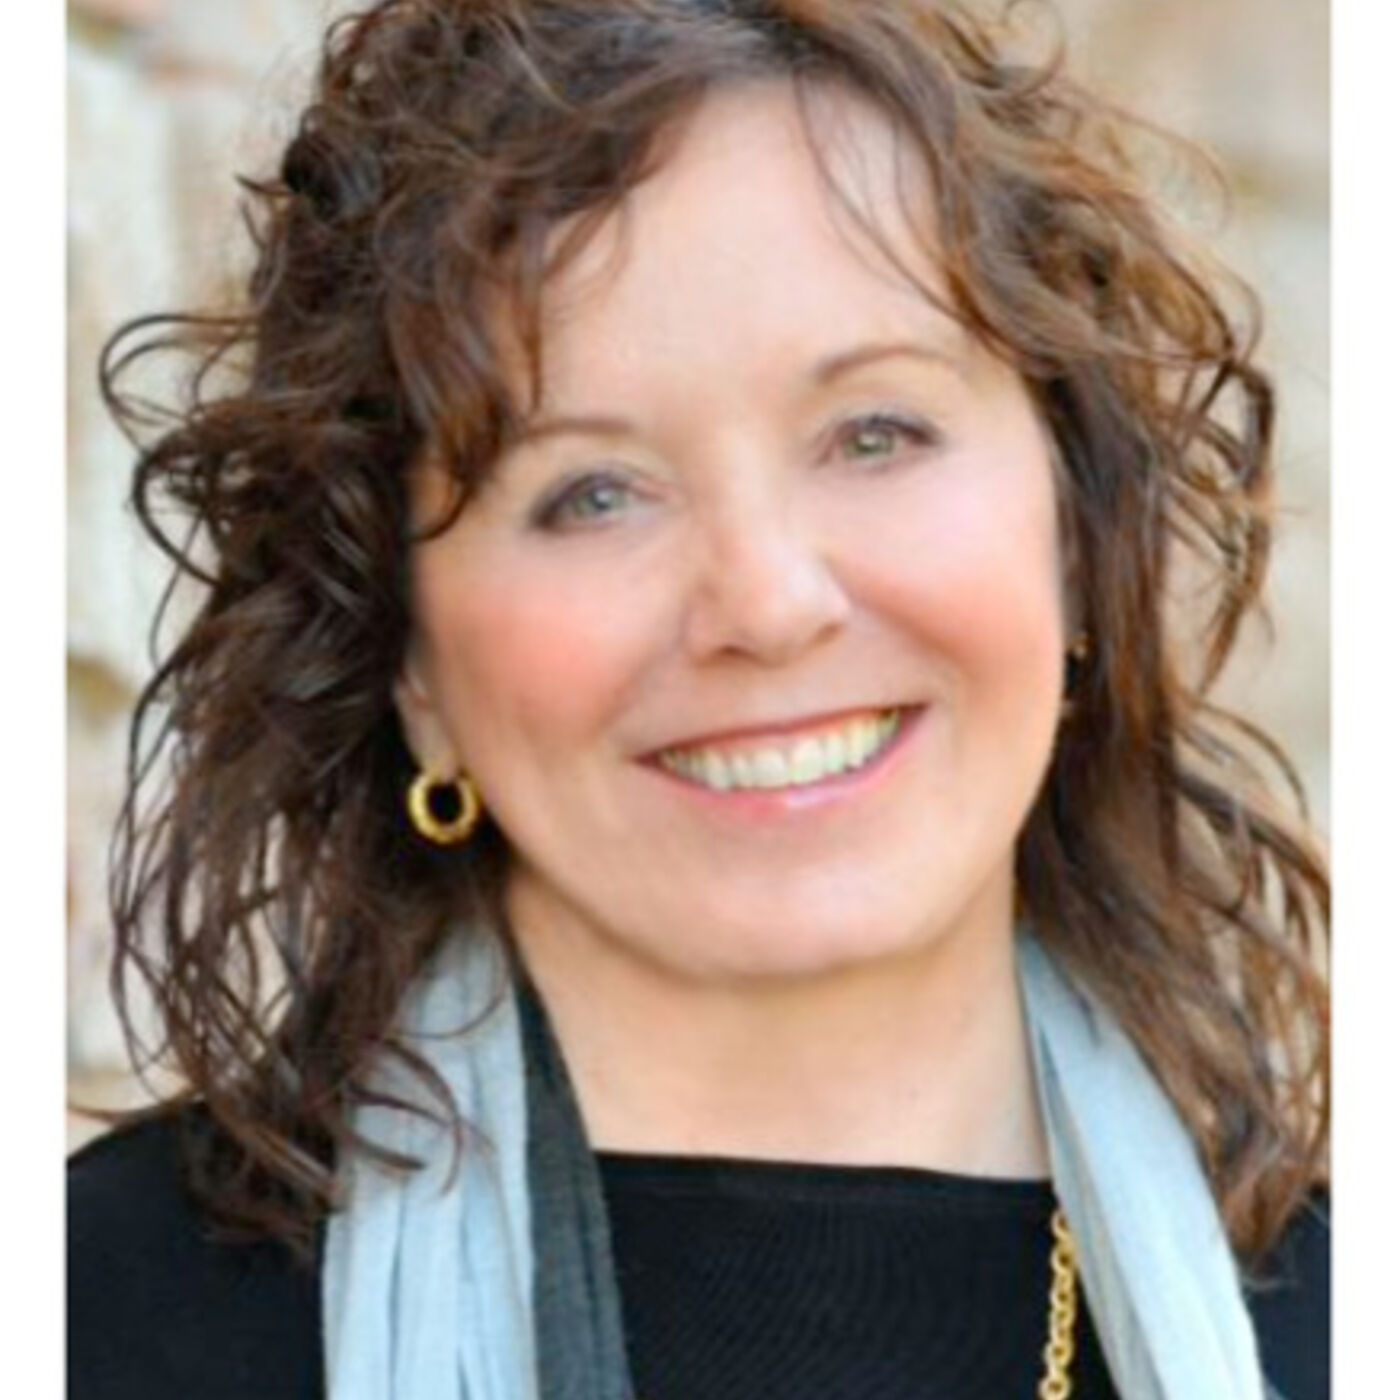 Linda Bearman, child actress to elite national voiceover coach!